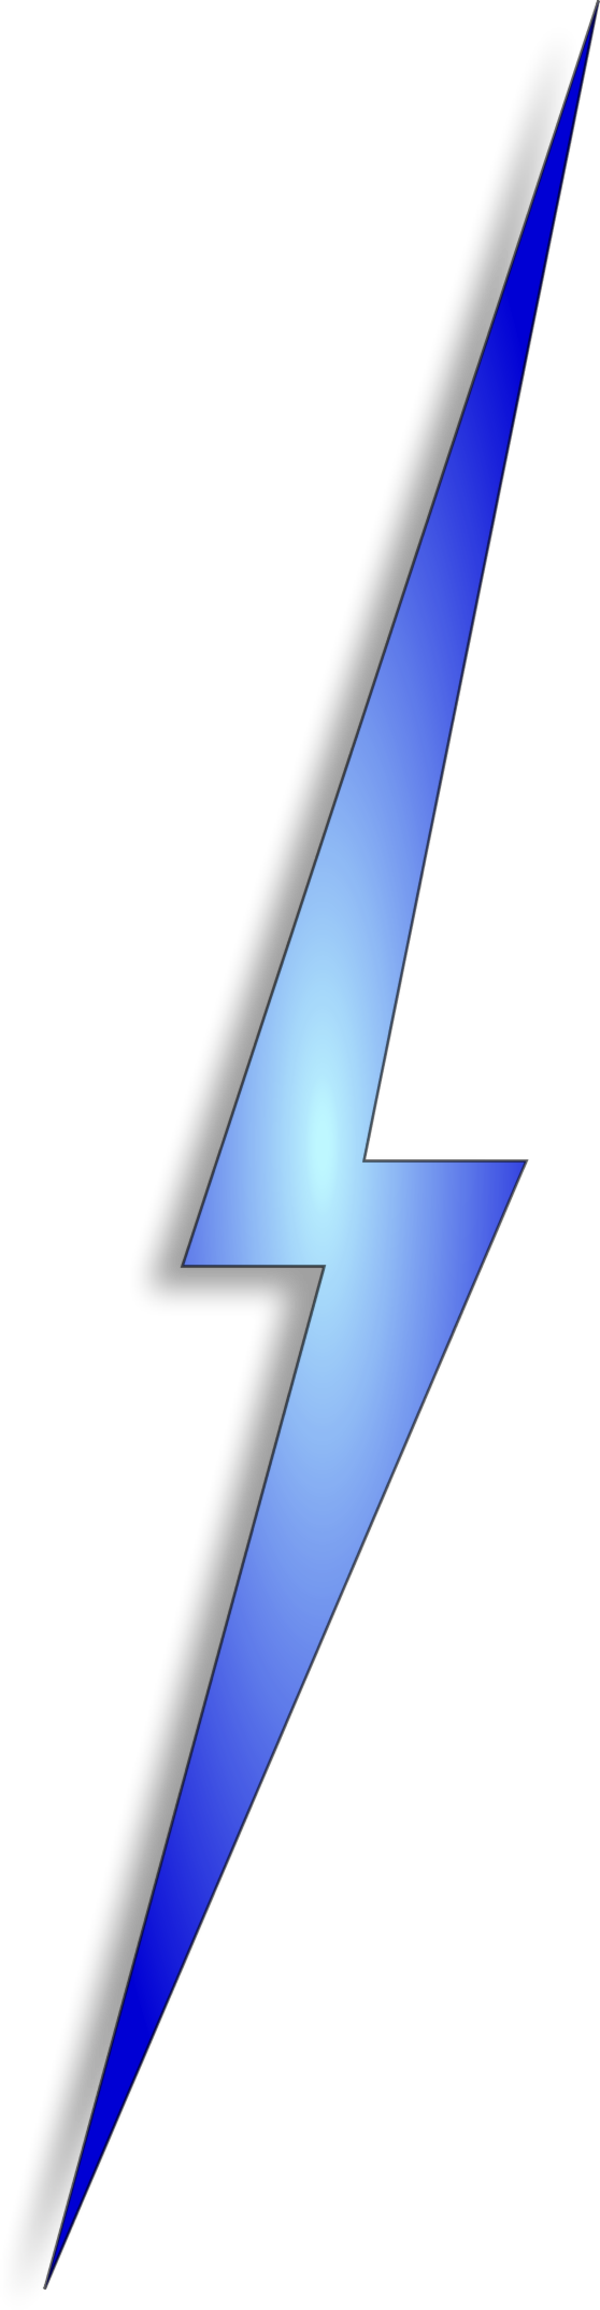 zeus lightning bolt symbol - photo #24